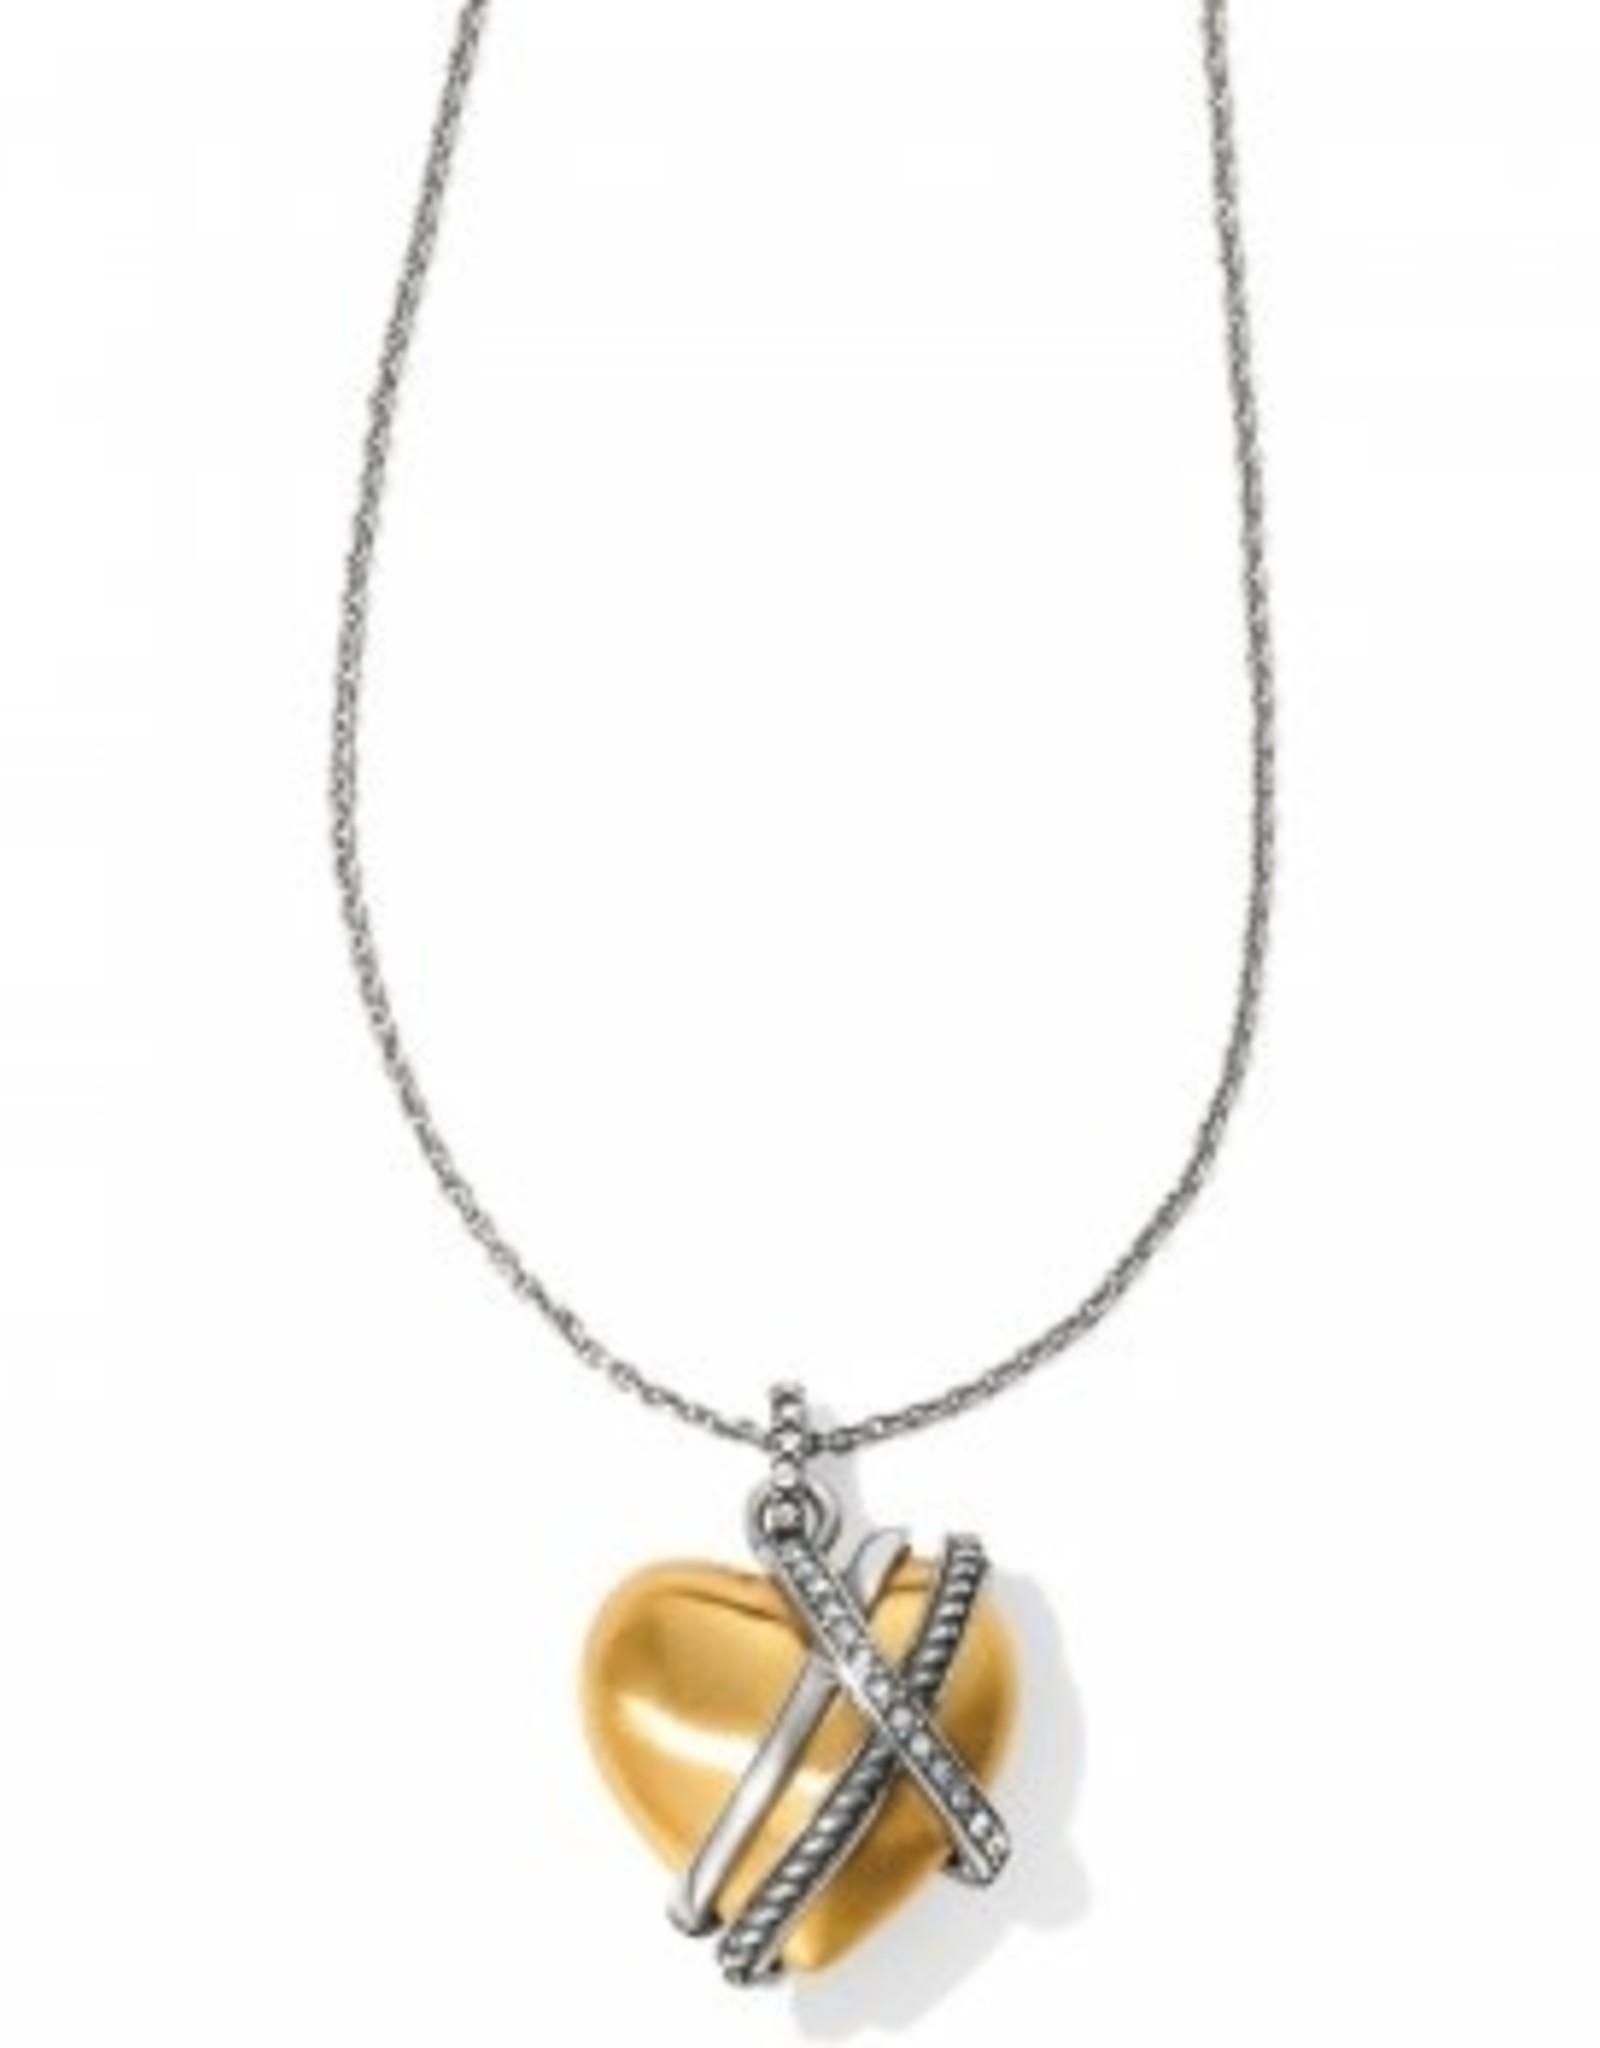 Brighton Brighton, Neptune's Rings Golden Heart Necklace